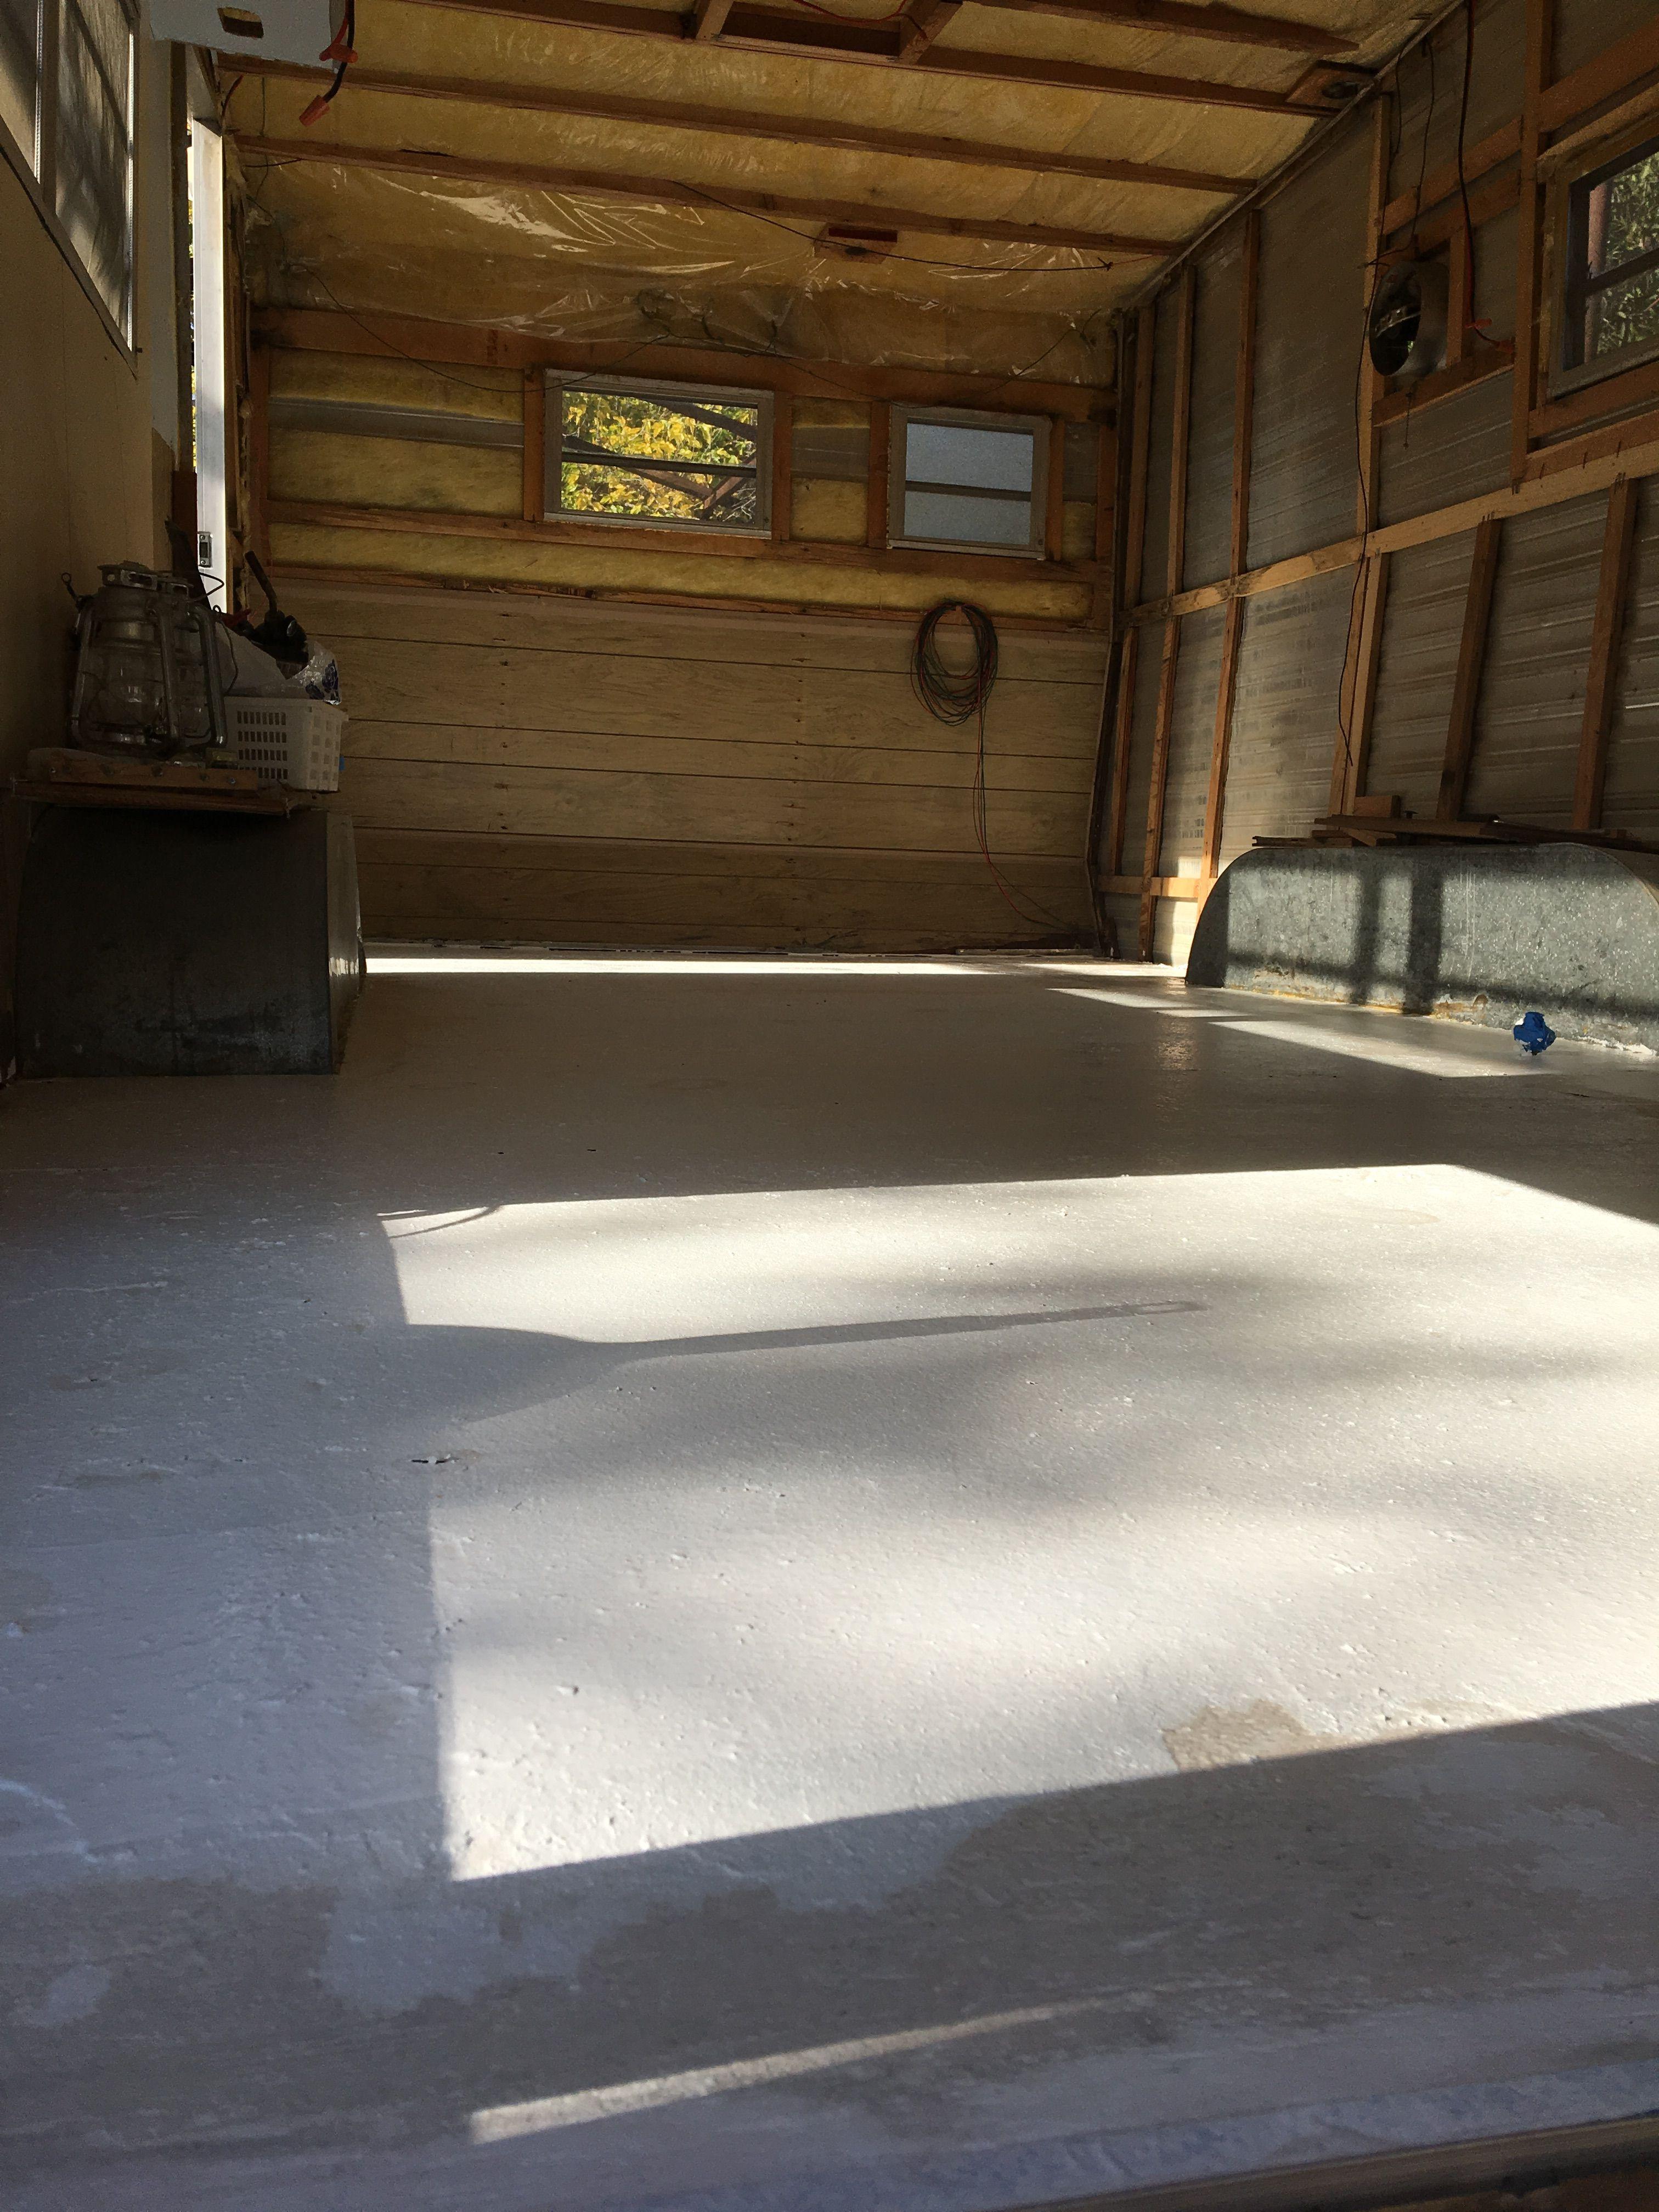 Floor Is Sealed With 2 Coats Of Kilz 2 Primer Kilz Landmark